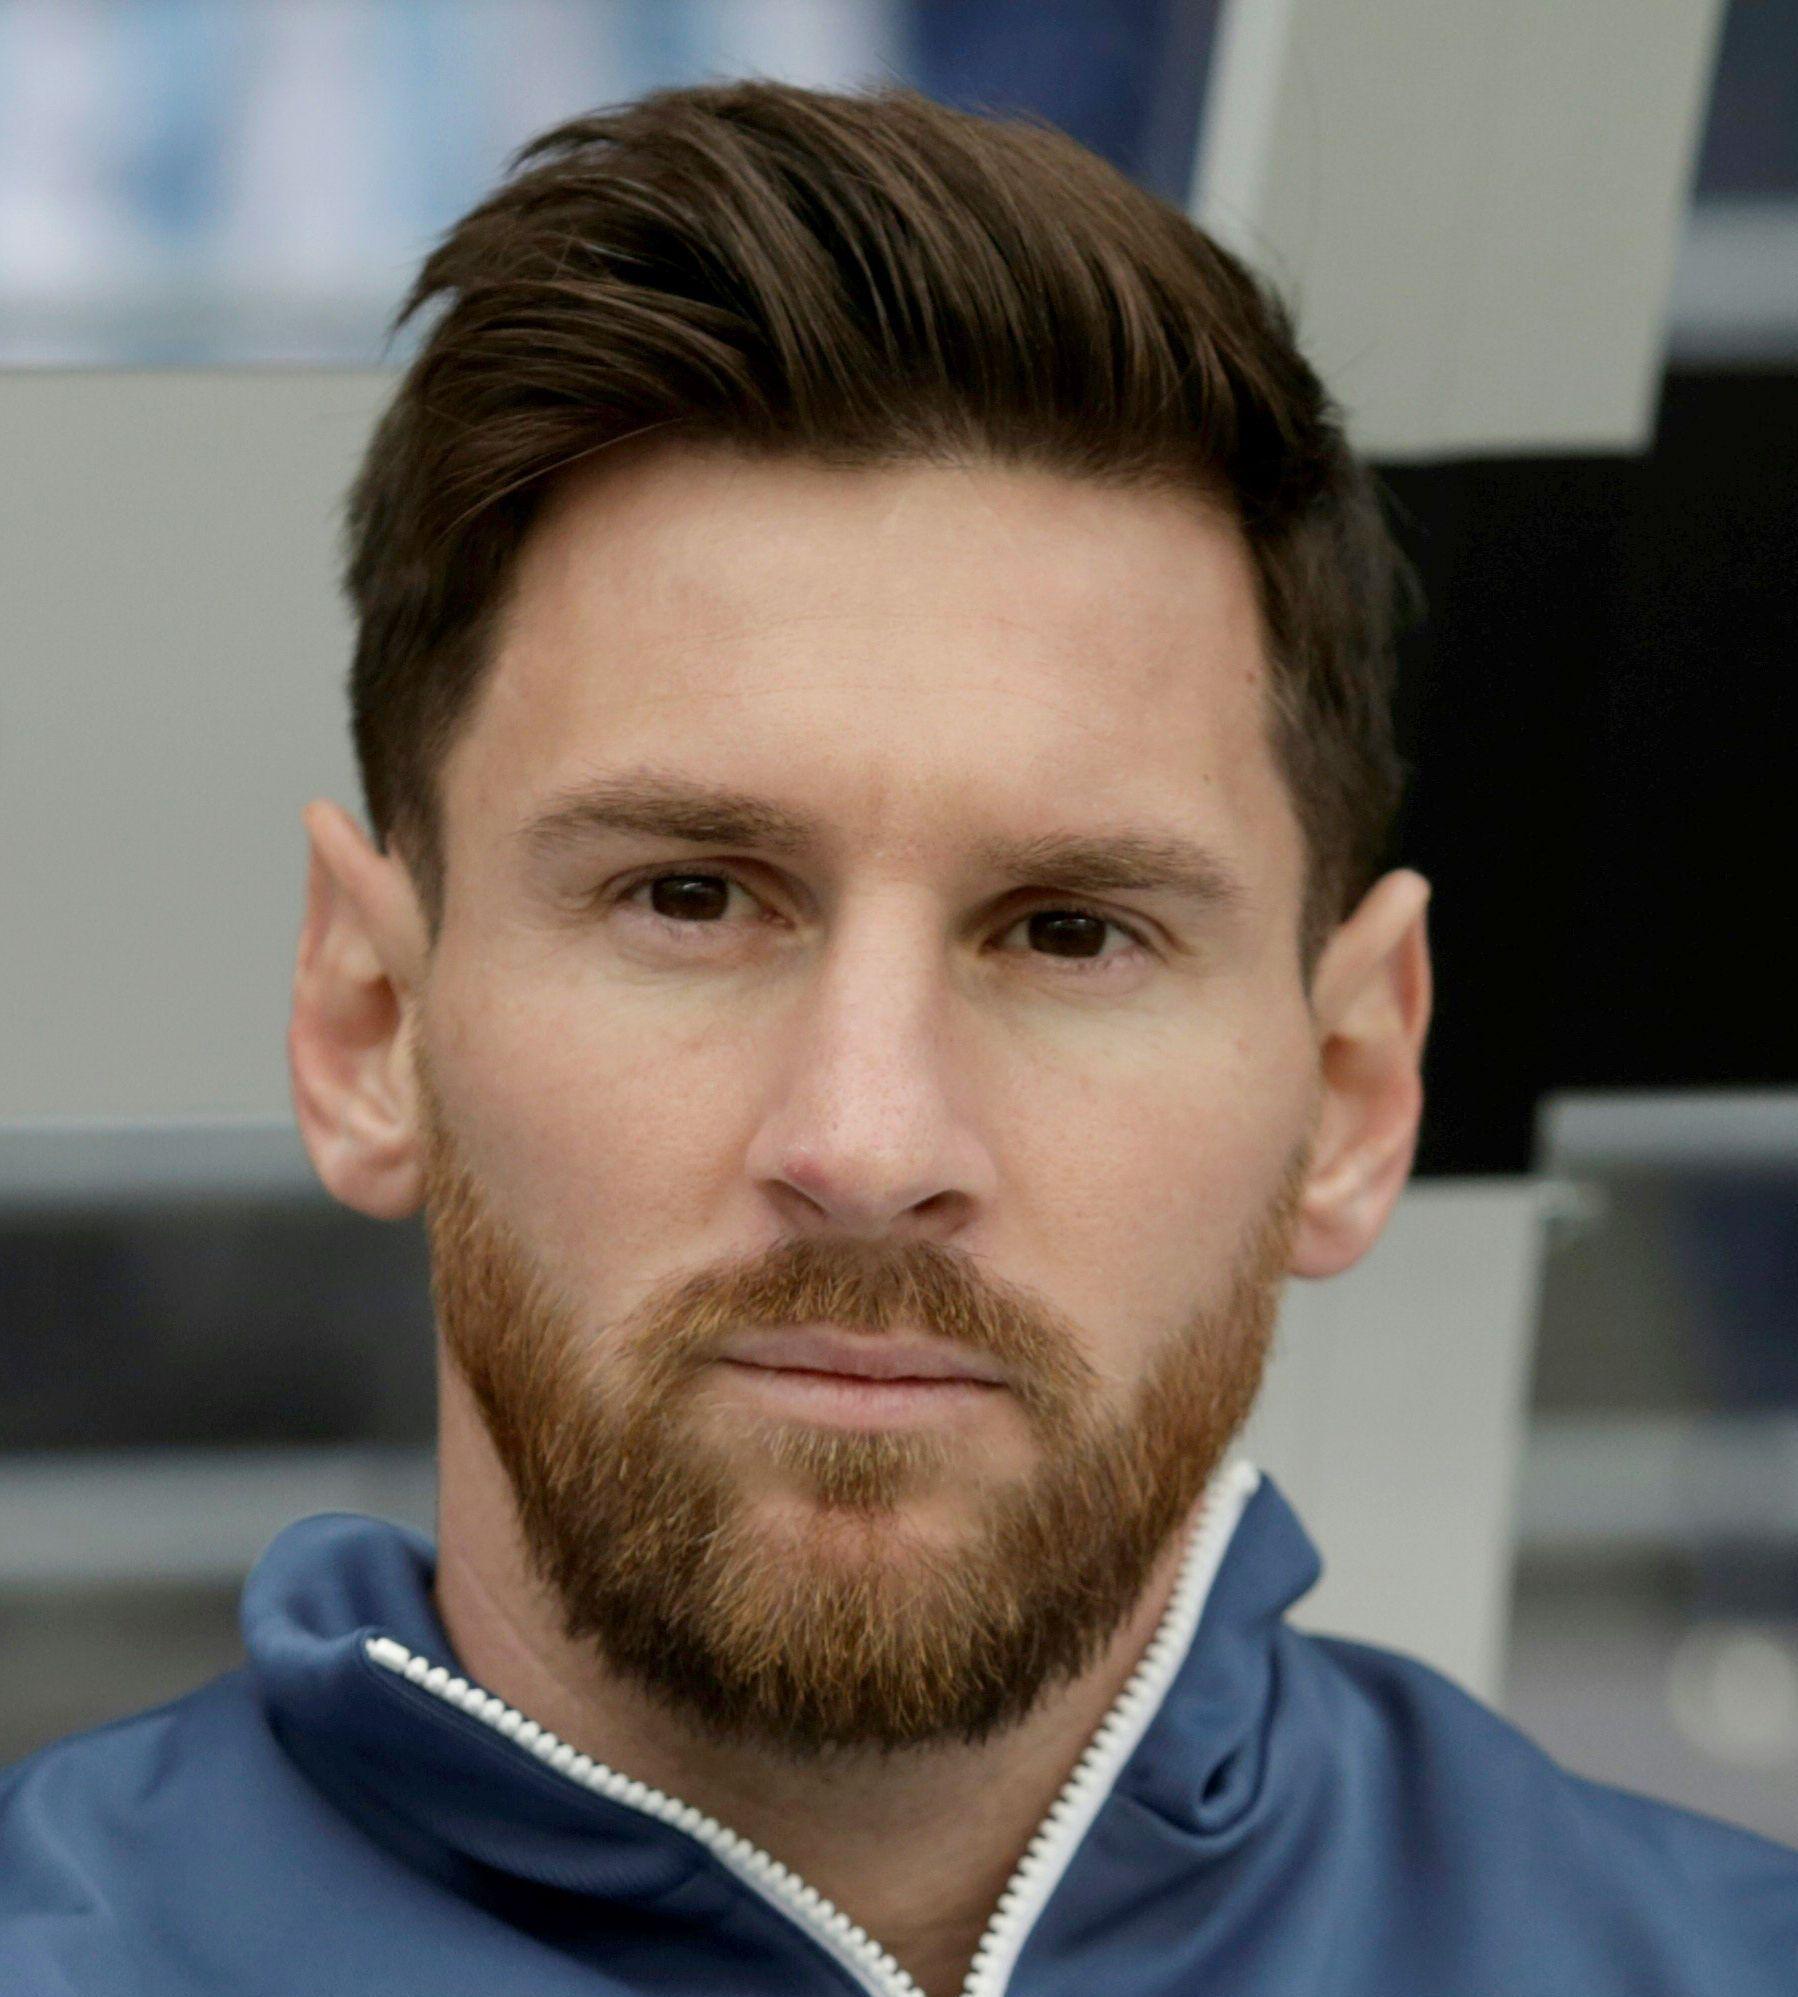 Lionel Messi Haircut Lionel messi Pinterest Messi Lionel